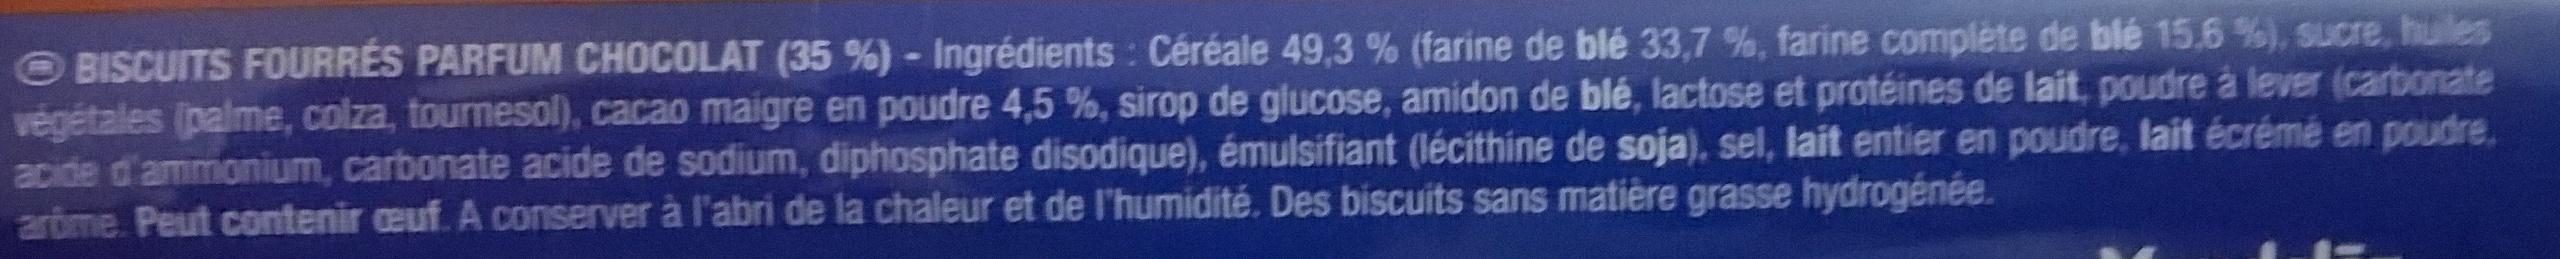 Prince goût Chocolat - Ingrediënten - fr